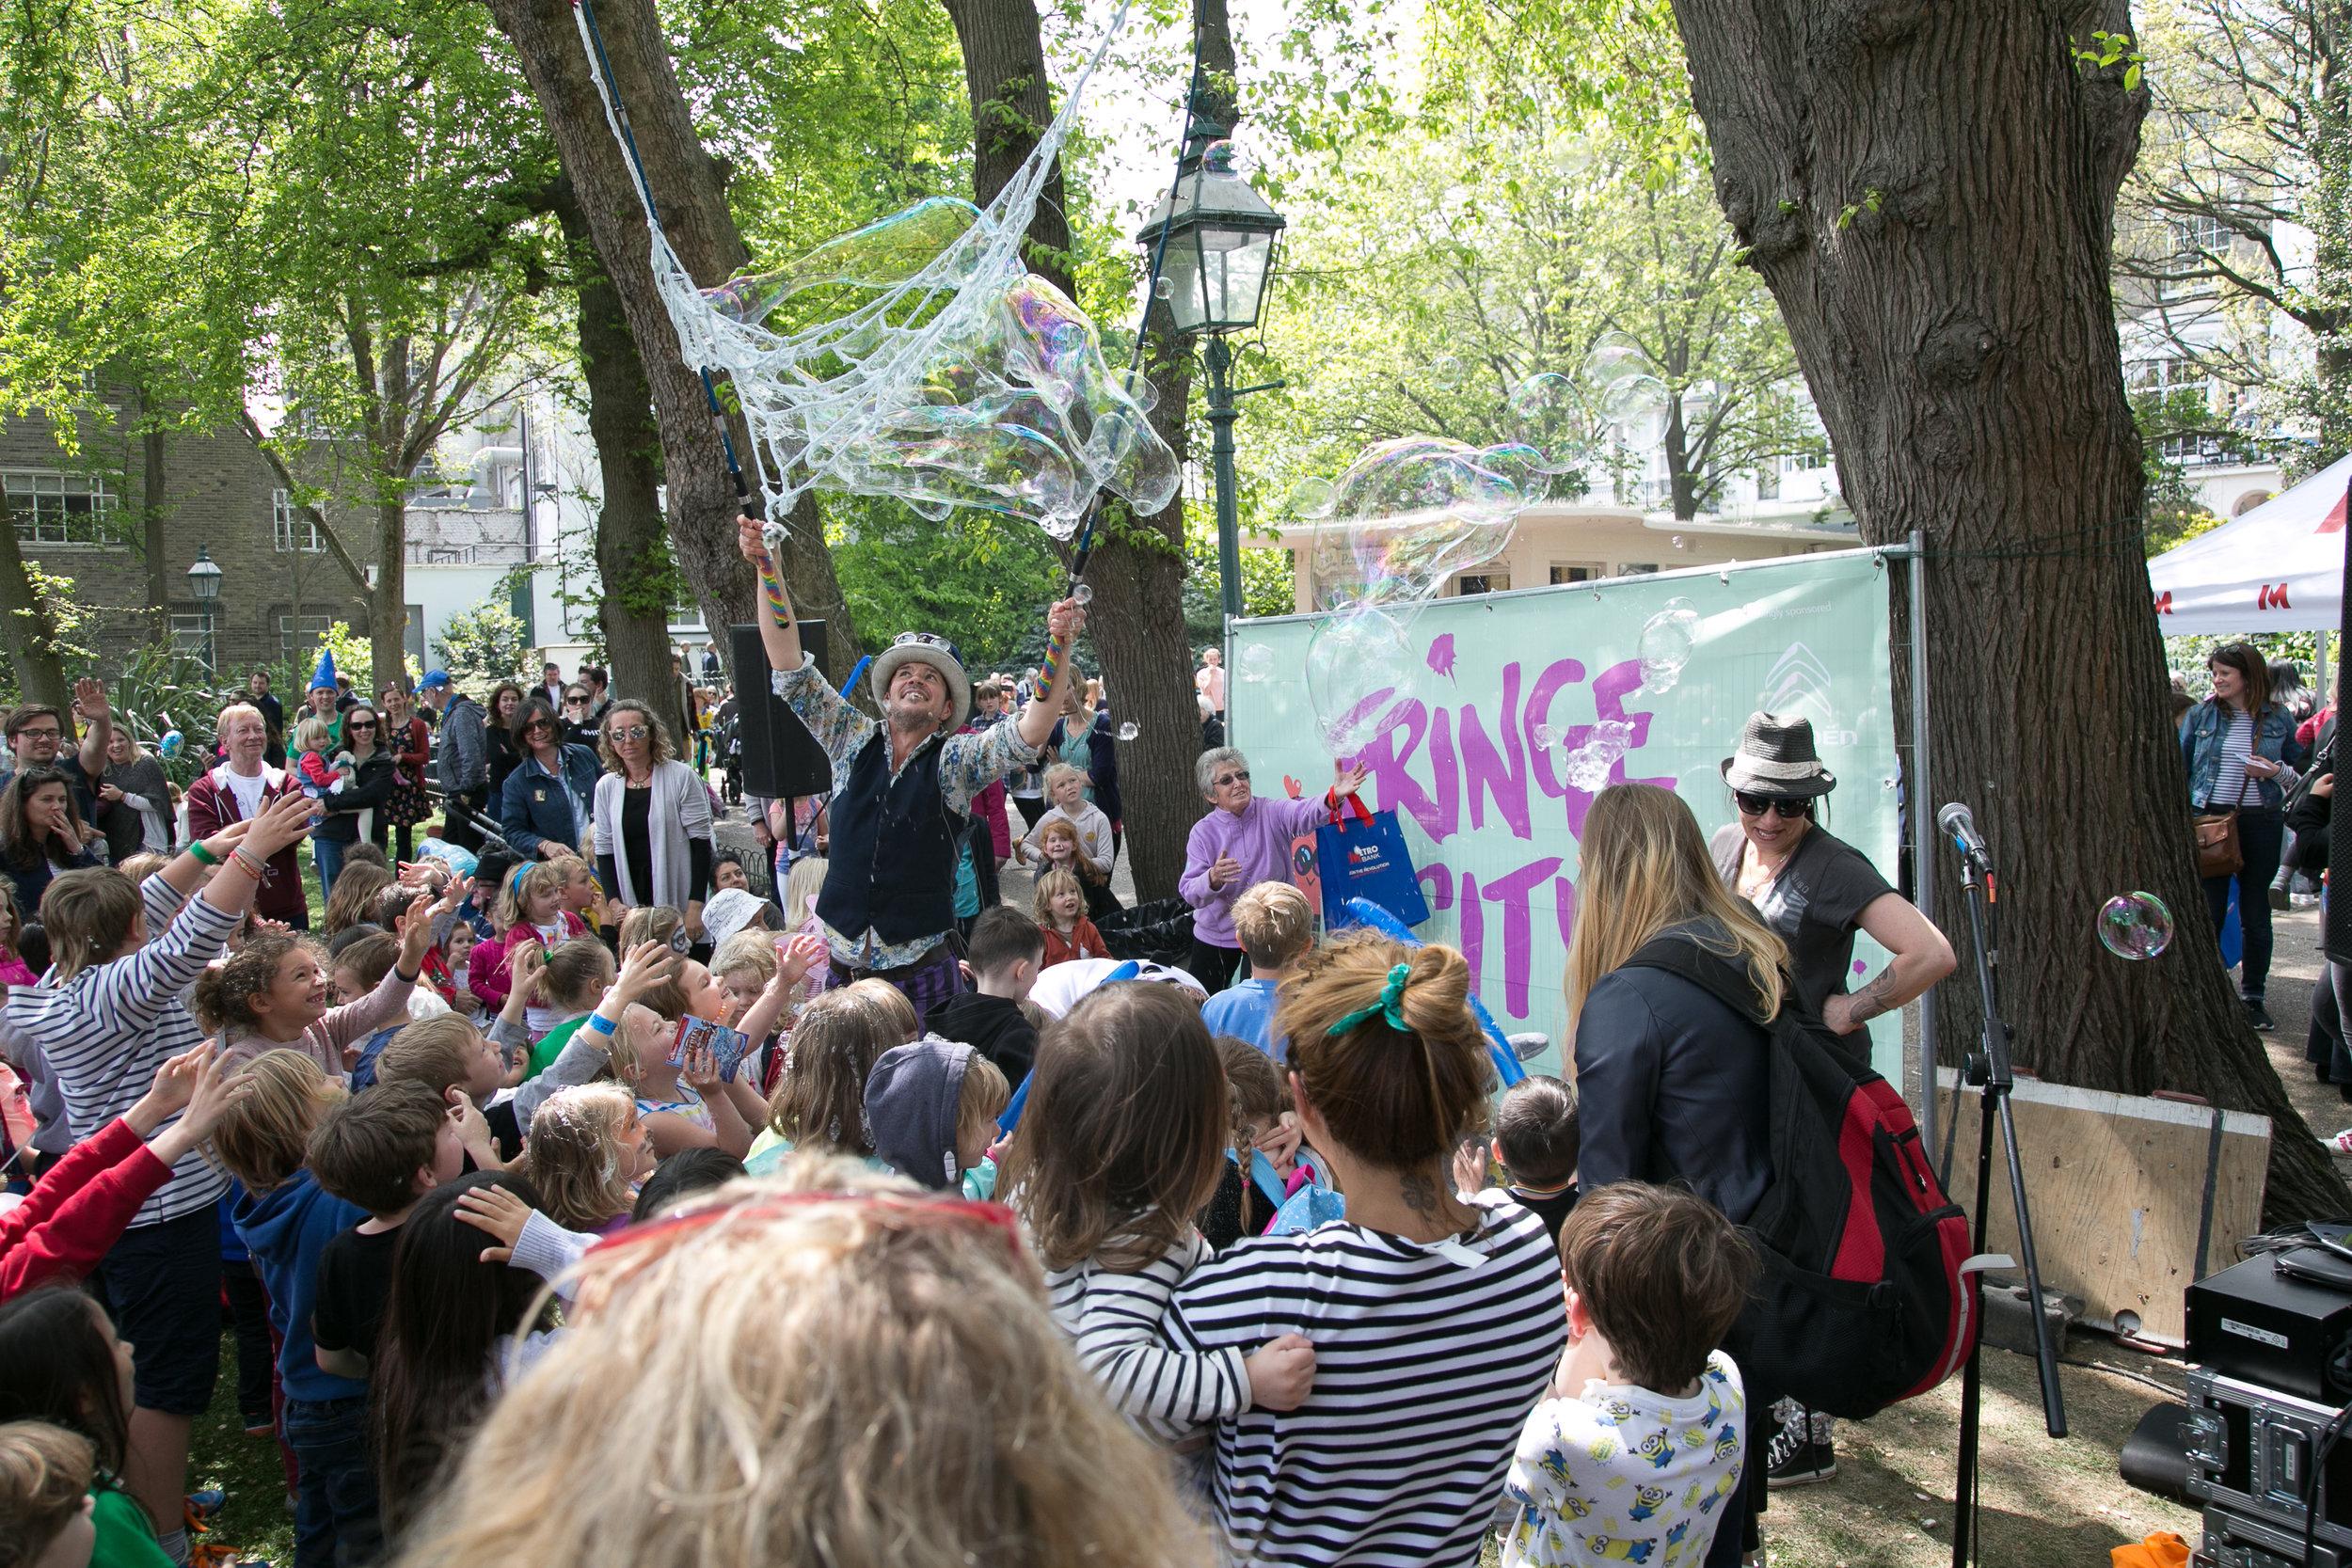 Brighton fringe 2017 - Mundial images - Fringe city May 6th - hi res-3630.jpg